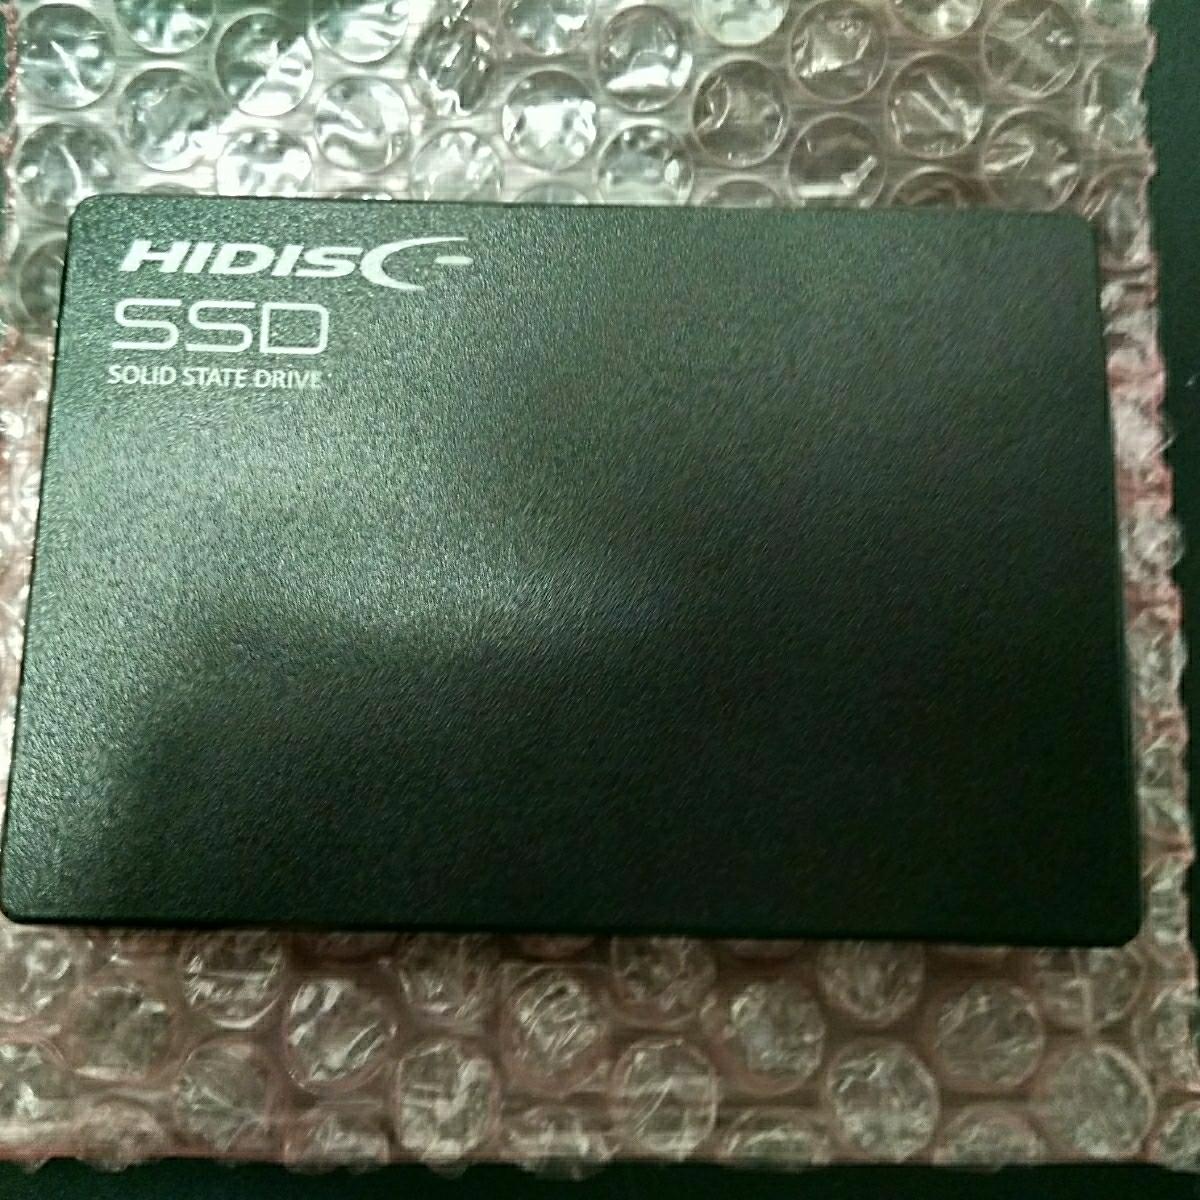 TDKのOEMメーカー Ridata Ritek Hidisk 2.5インチ120GBSSD 新品1年保障つき クリックポスト可